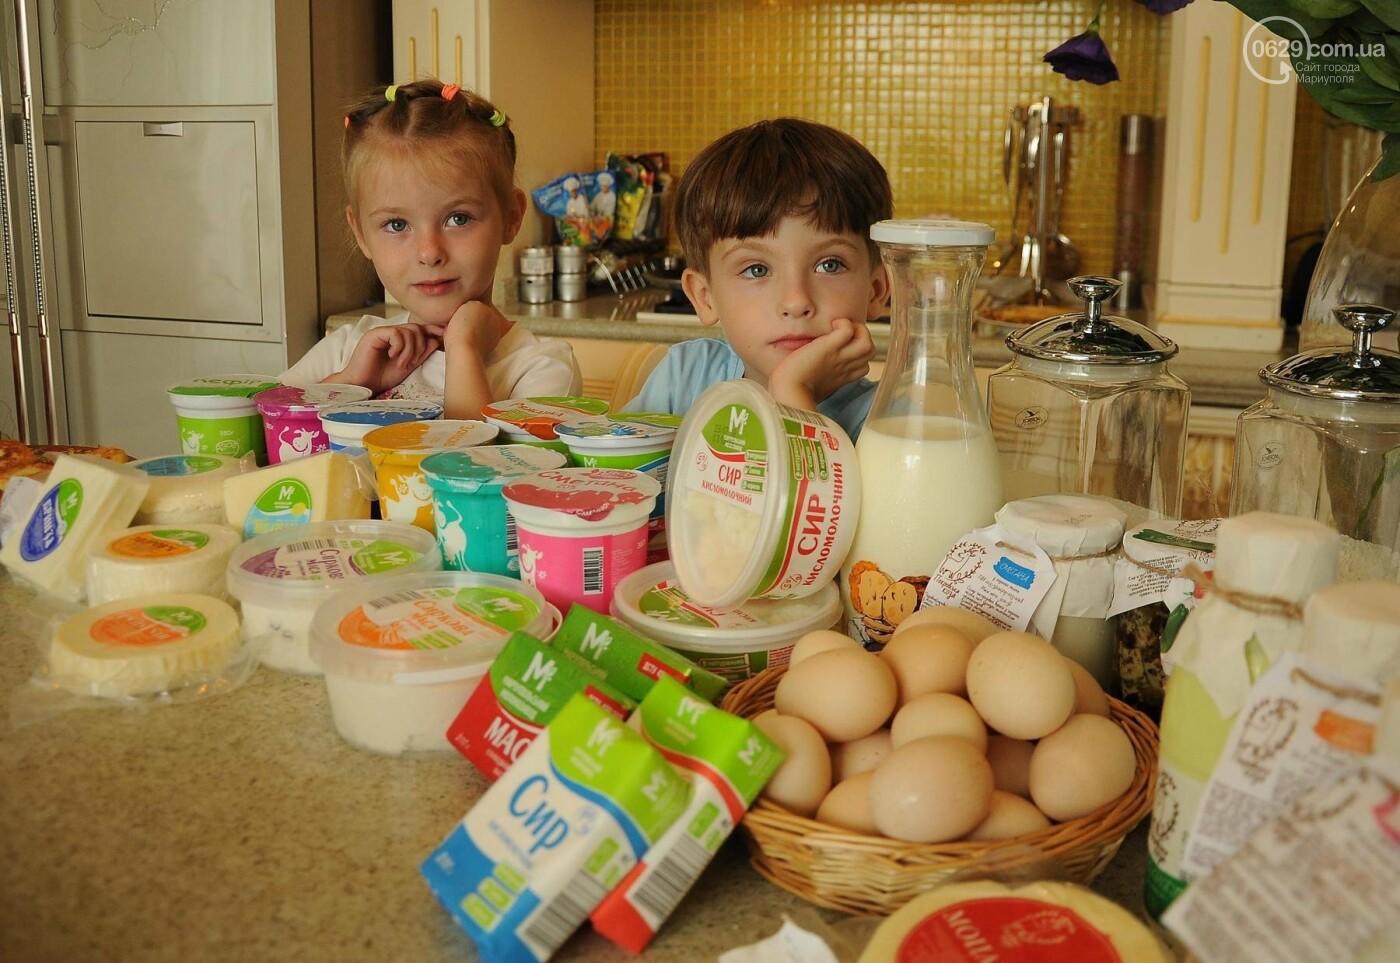 Мариупольский молокозавод дарит 1000 гривен, фото-12